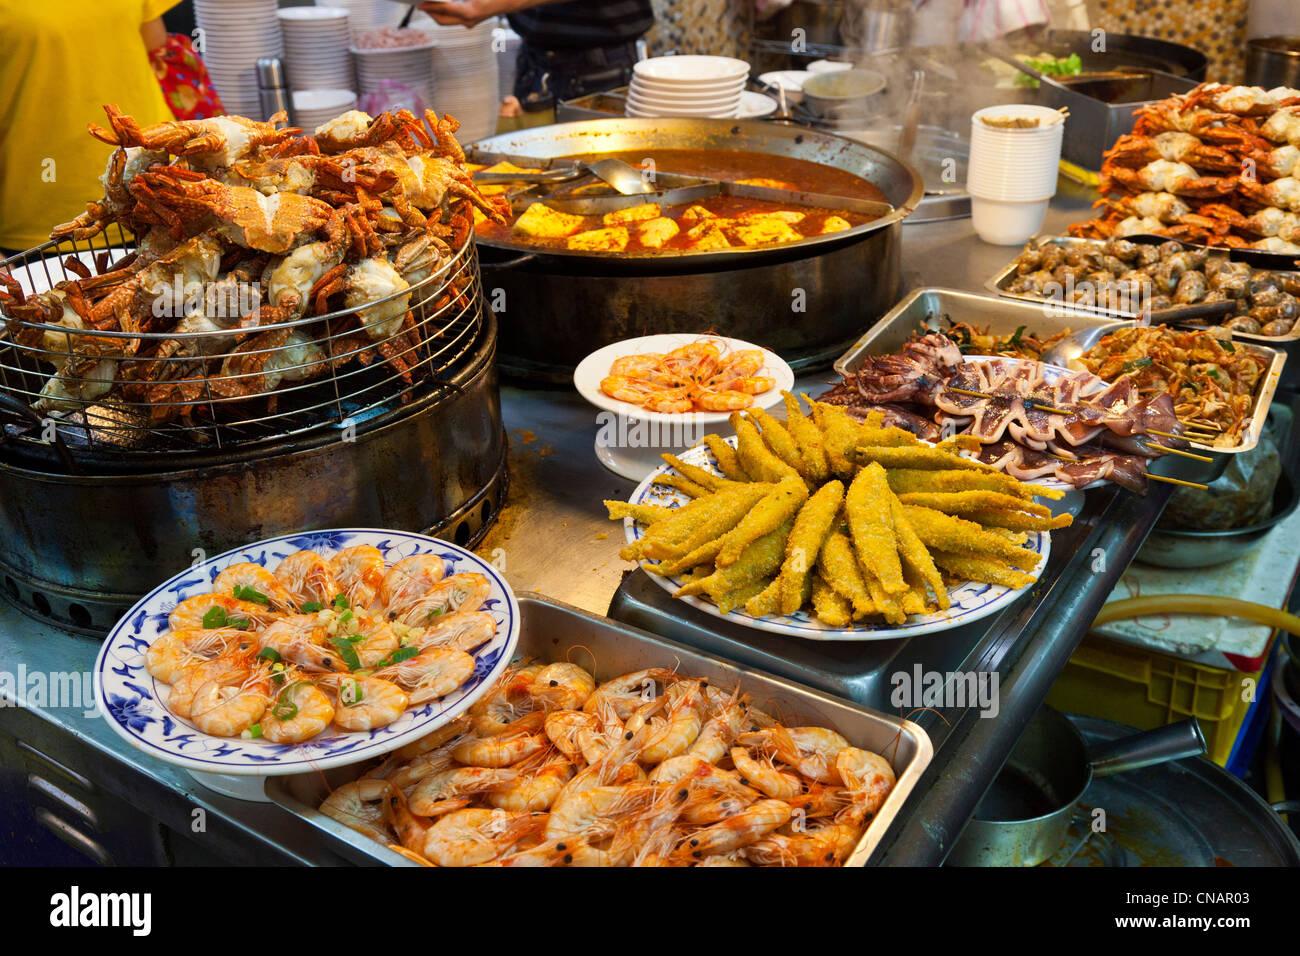 Aperitivos de marisco en el Mercado Nocturno de Shilin calada Taipei Taiwán. JMH5995 Imagen De Stock